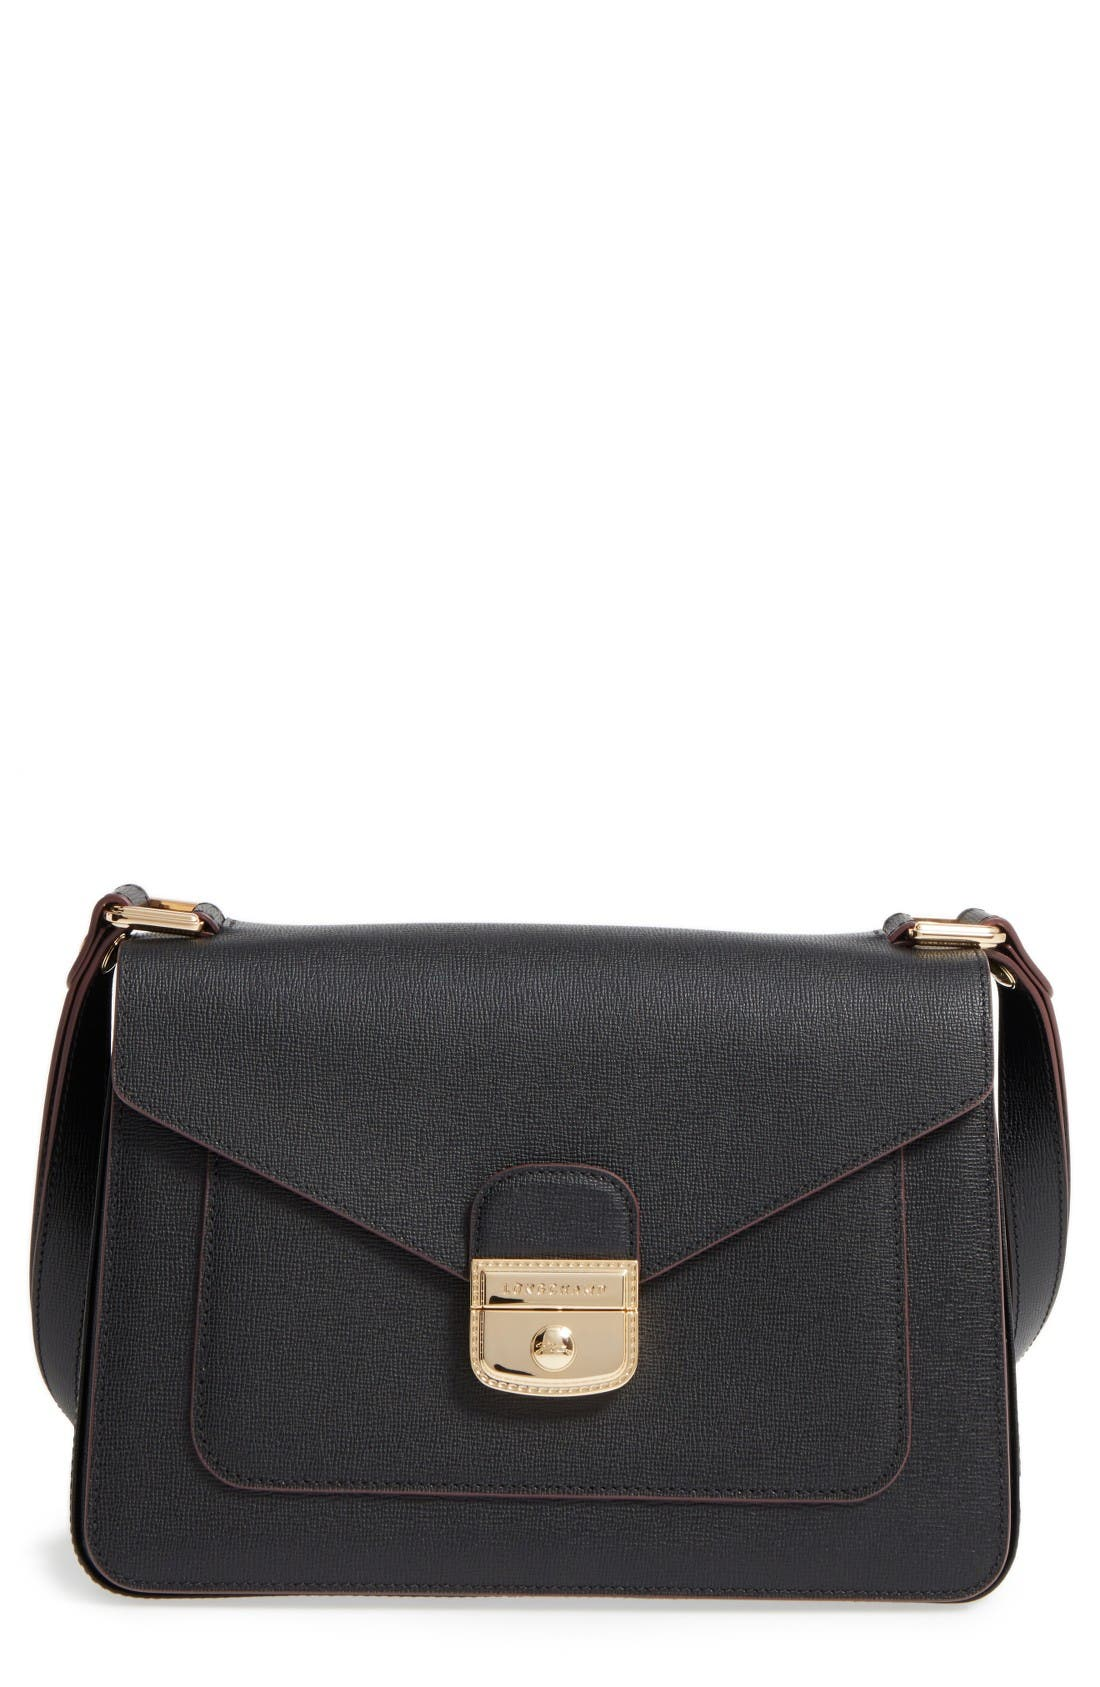 Alternate Image 1 Selected - Longchamp Pliage Heritage Leather Shoulder Bag